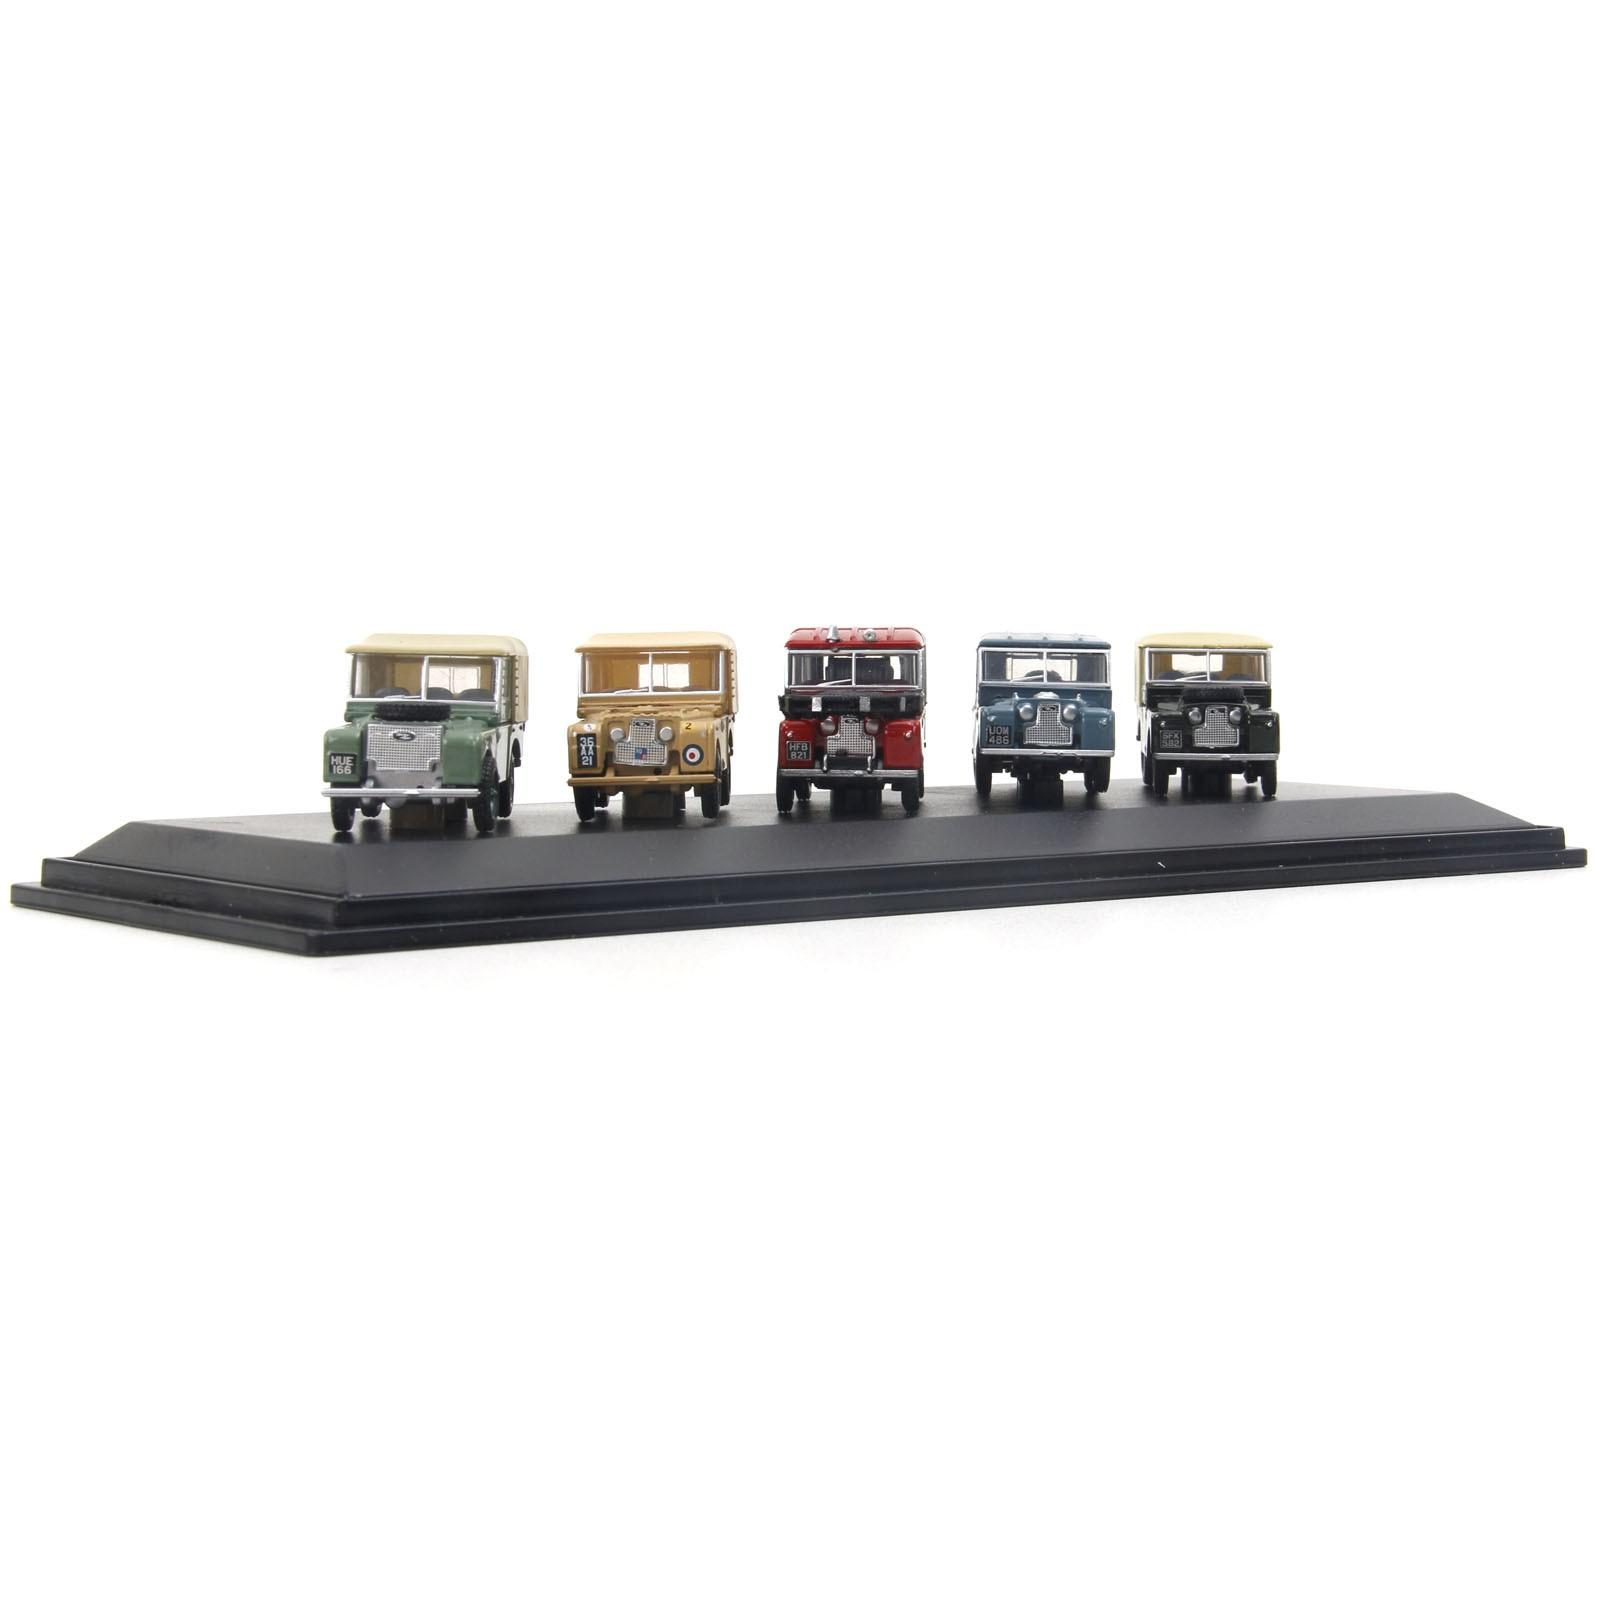 Set de Miniaturas em Metal - 1:76 - Land Rover Series - 5 miniaturas